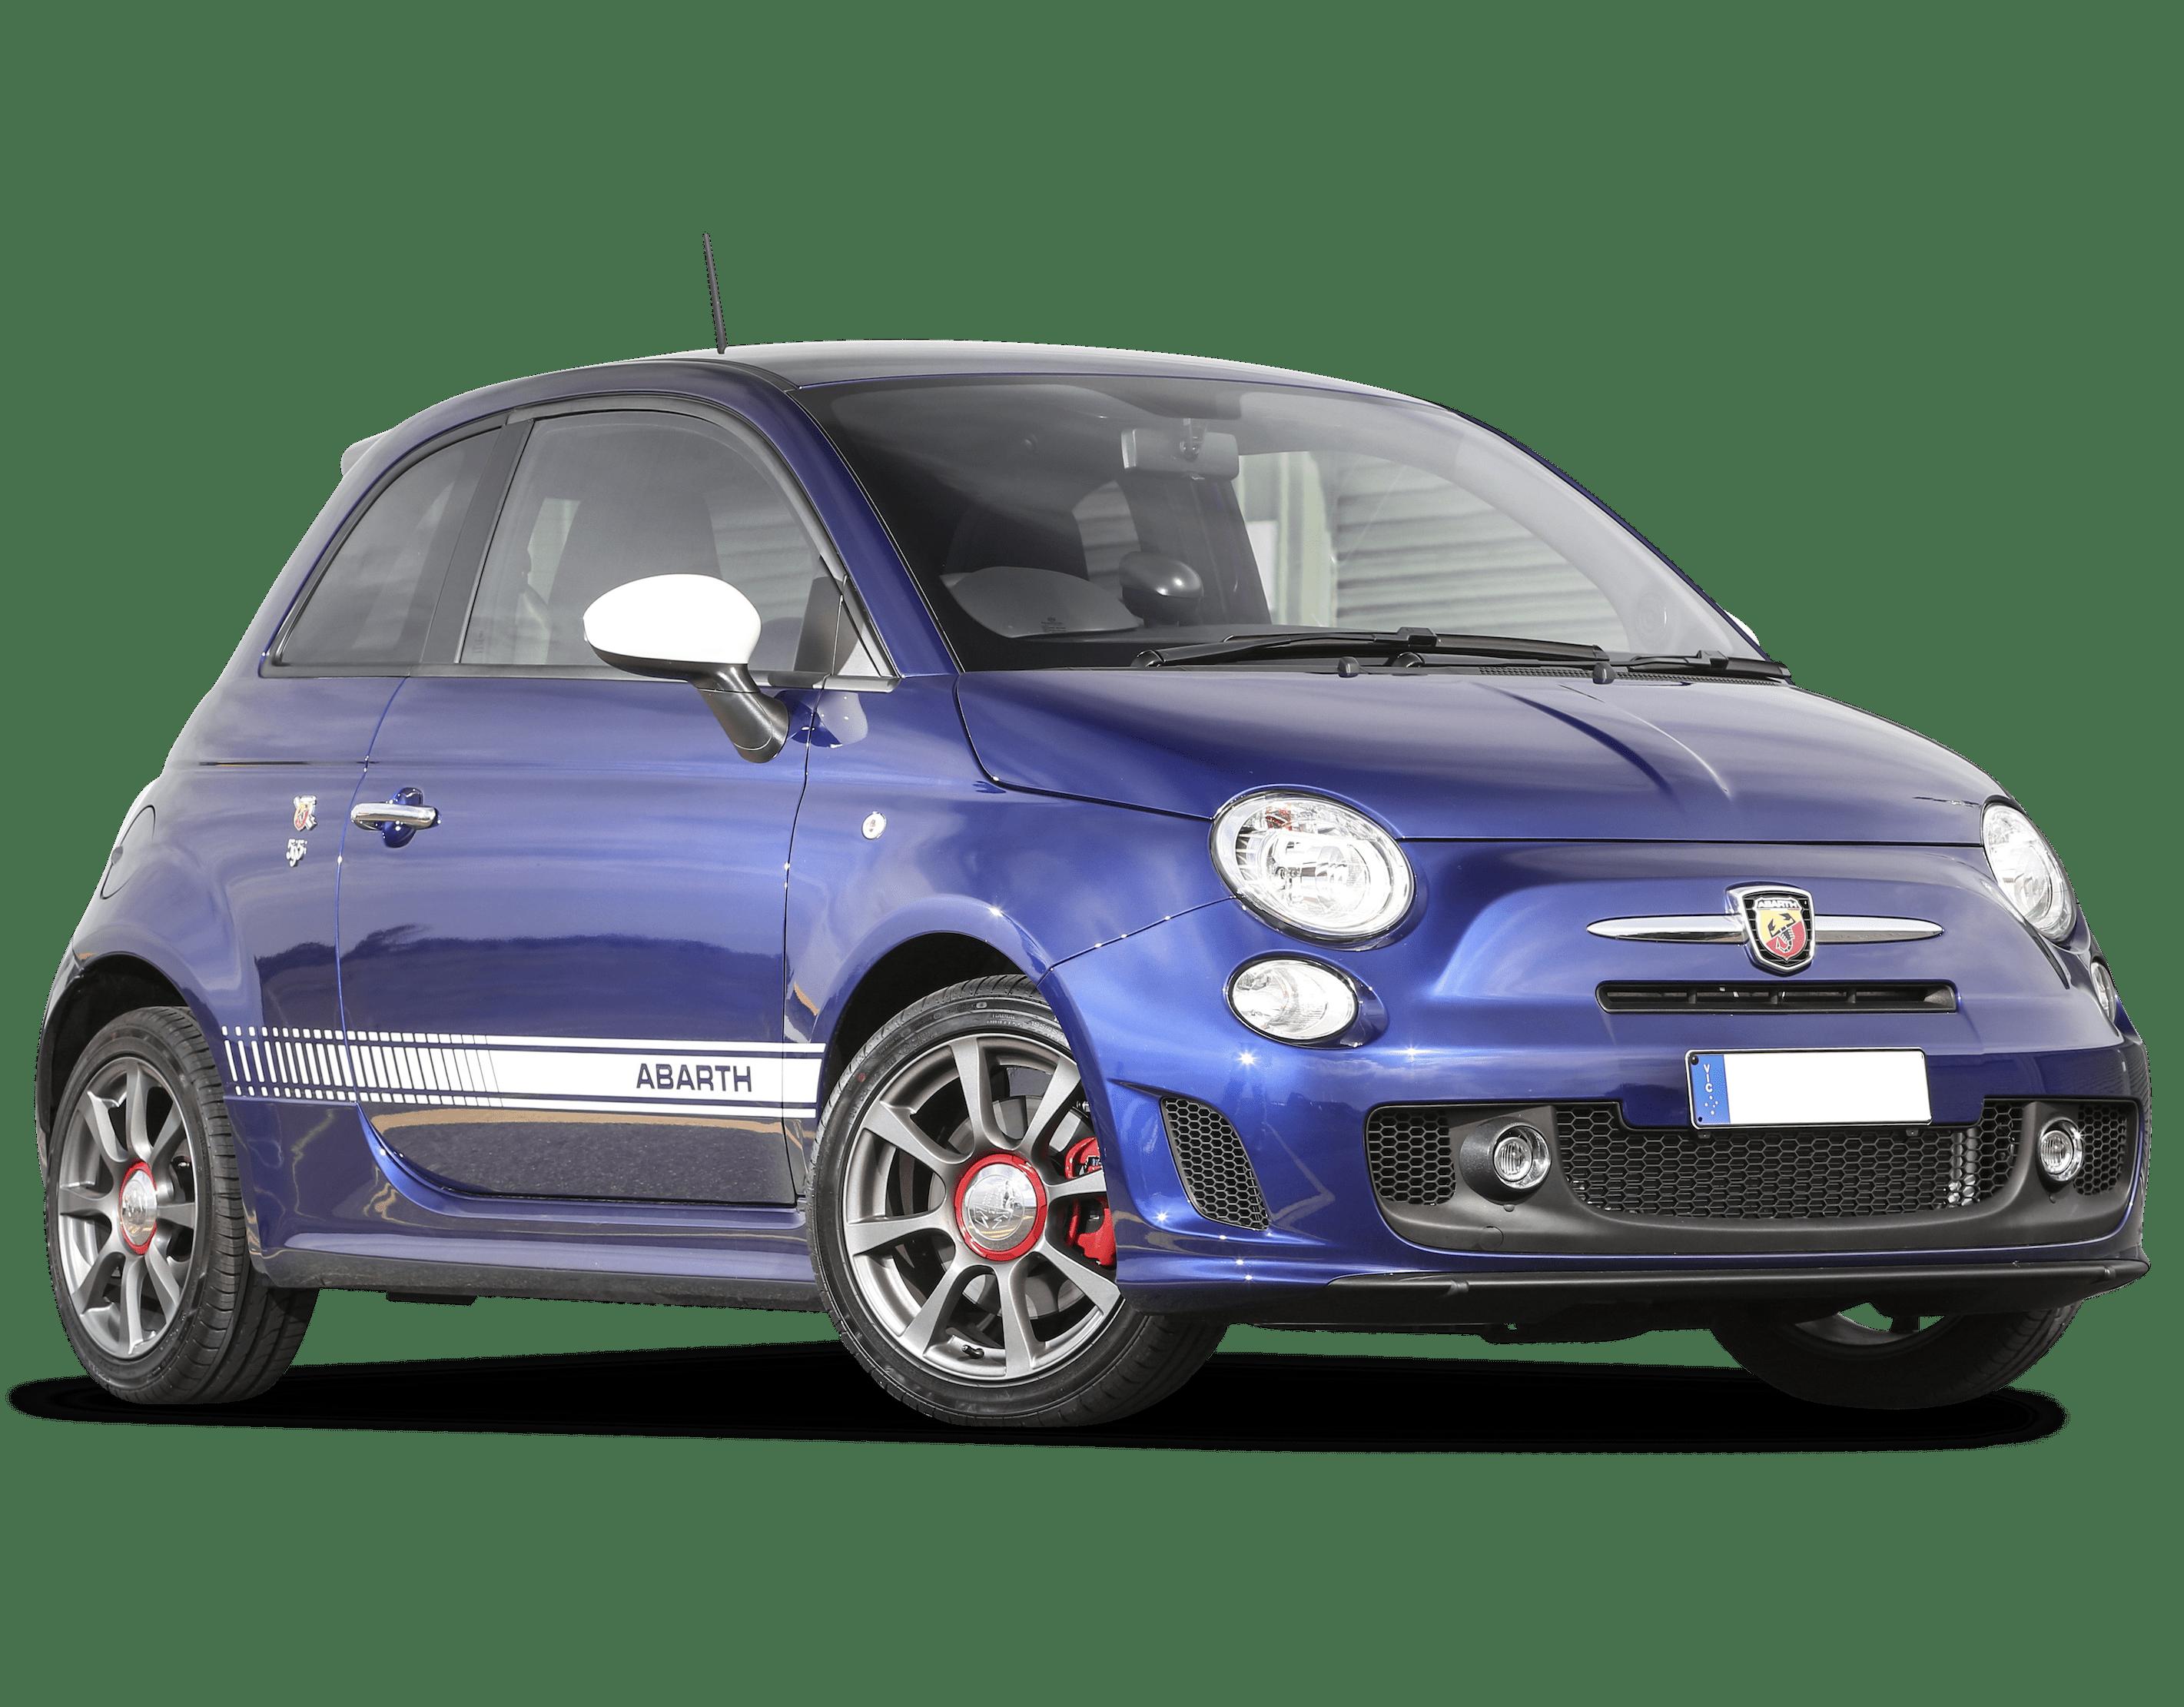 automotive experience content abarth stern arbath review perry autocontentexp autonxt fiat